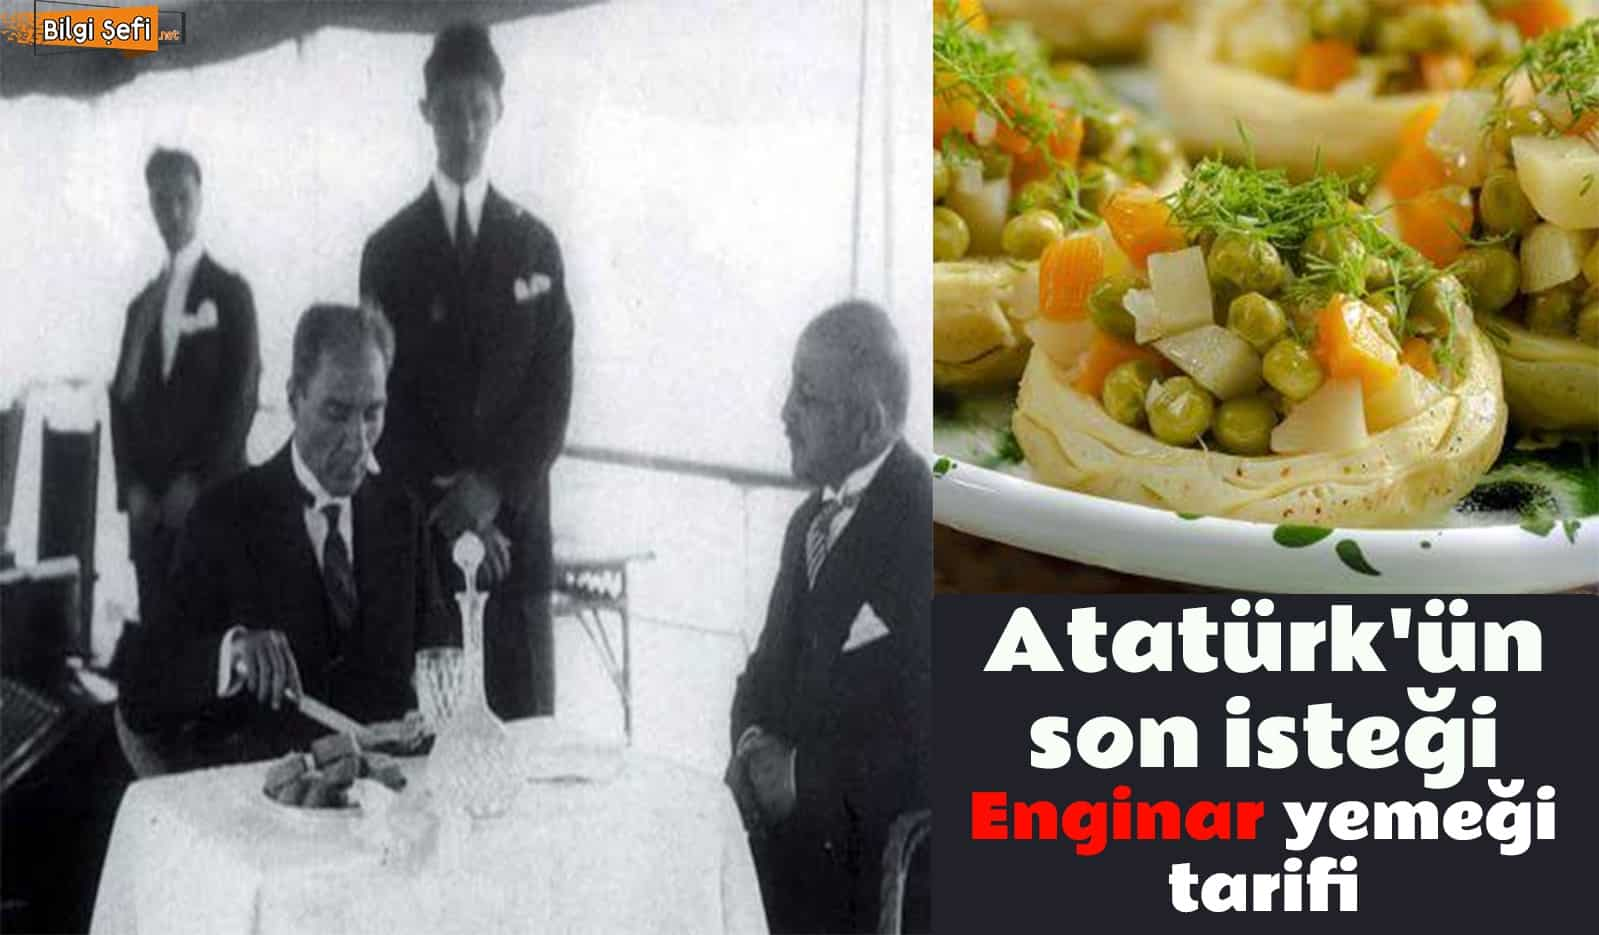 Atatürk ün son isteği Enginar tarifi